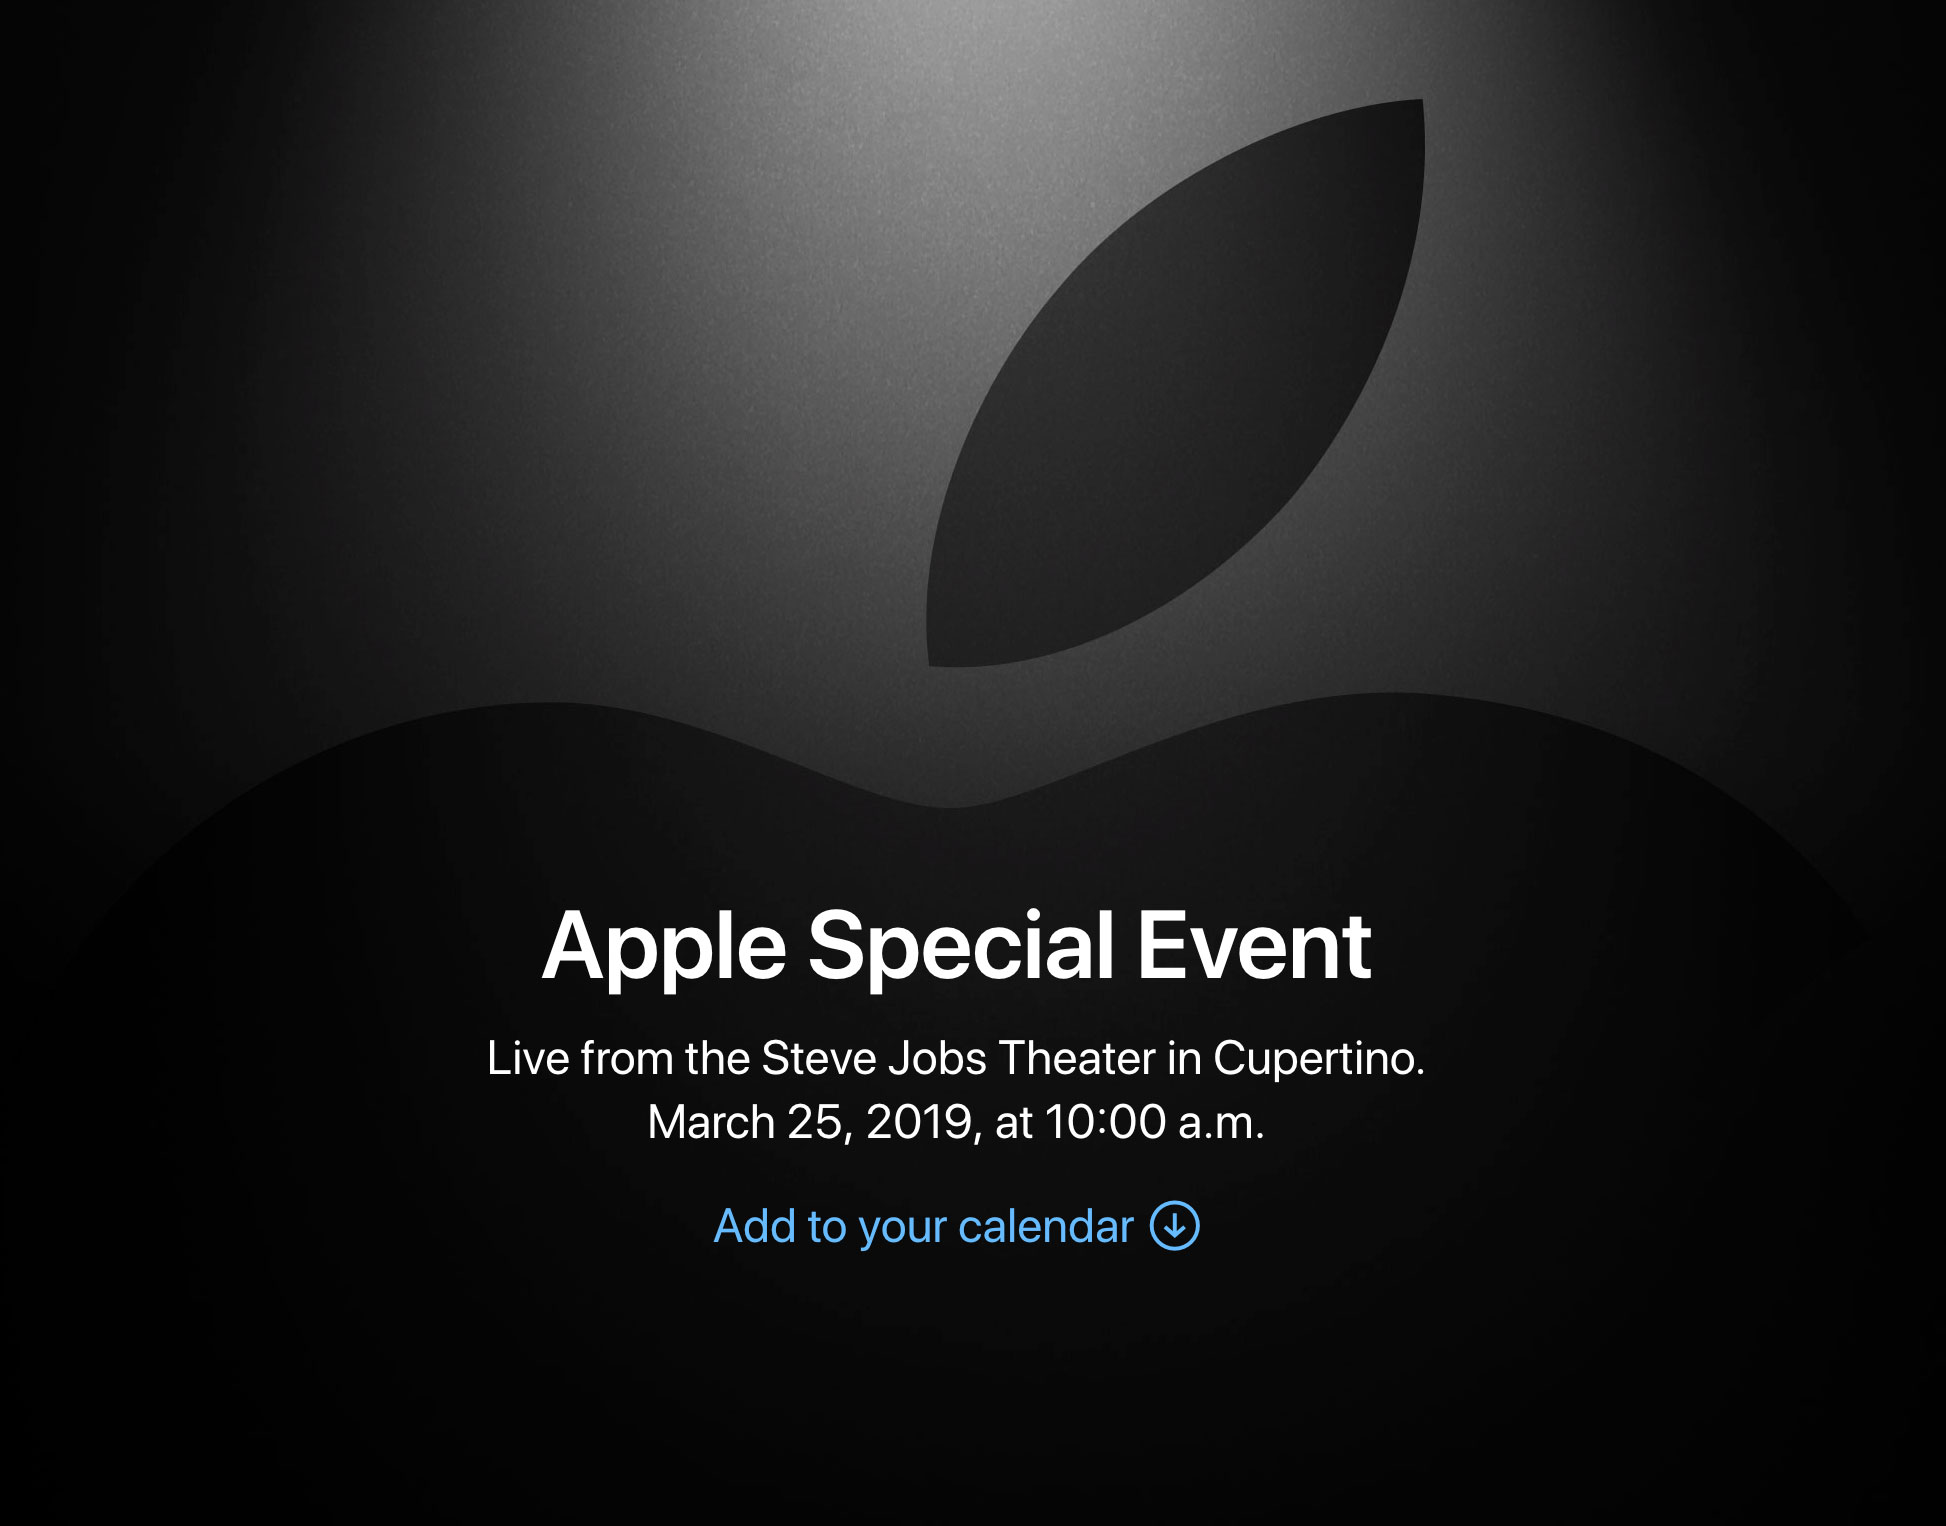 Evento especial del 25 de Marzo del 2019: It's show time